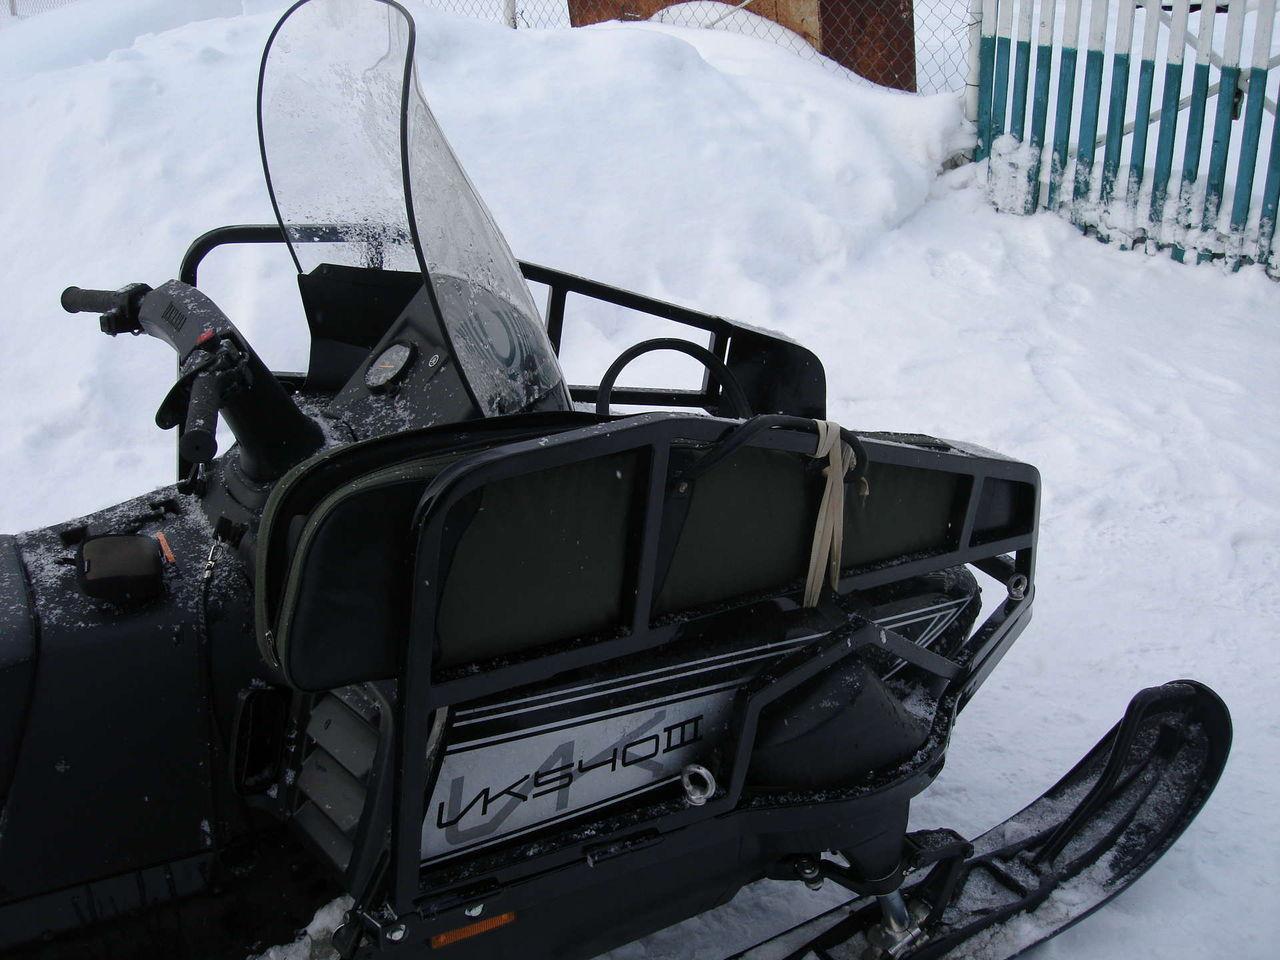 Бампер на снегоход своими руками 83